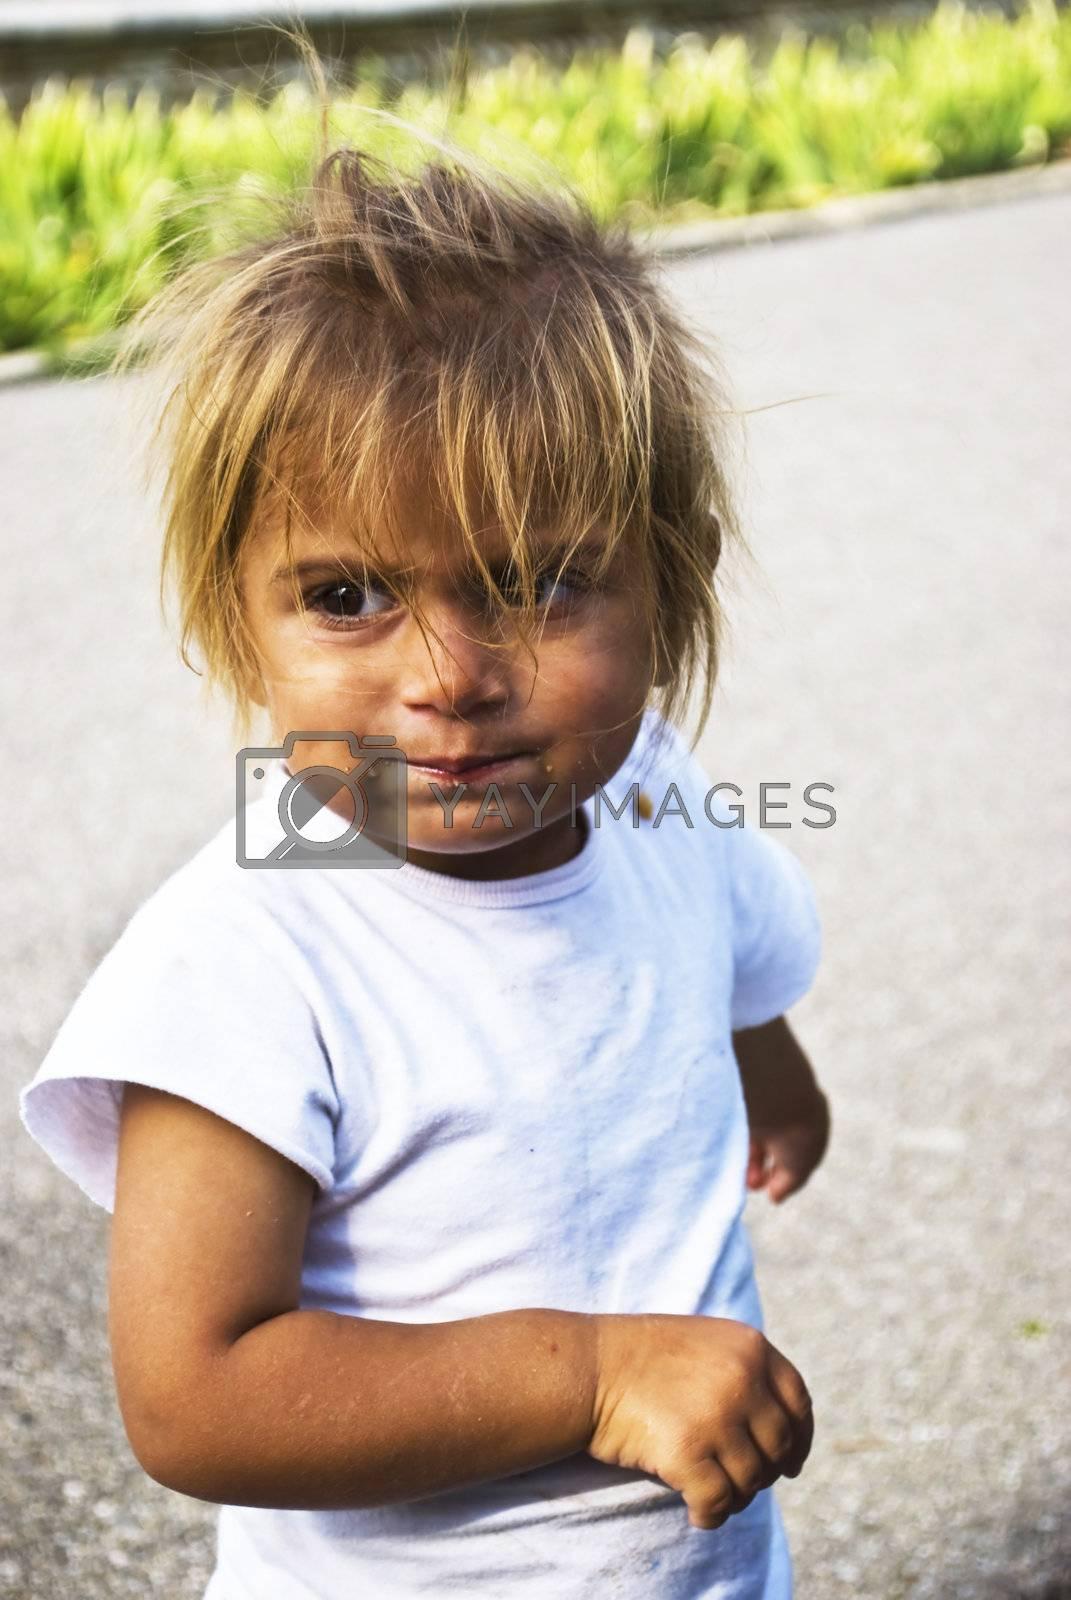 Royalty free image of beggar child by Dessie_bg